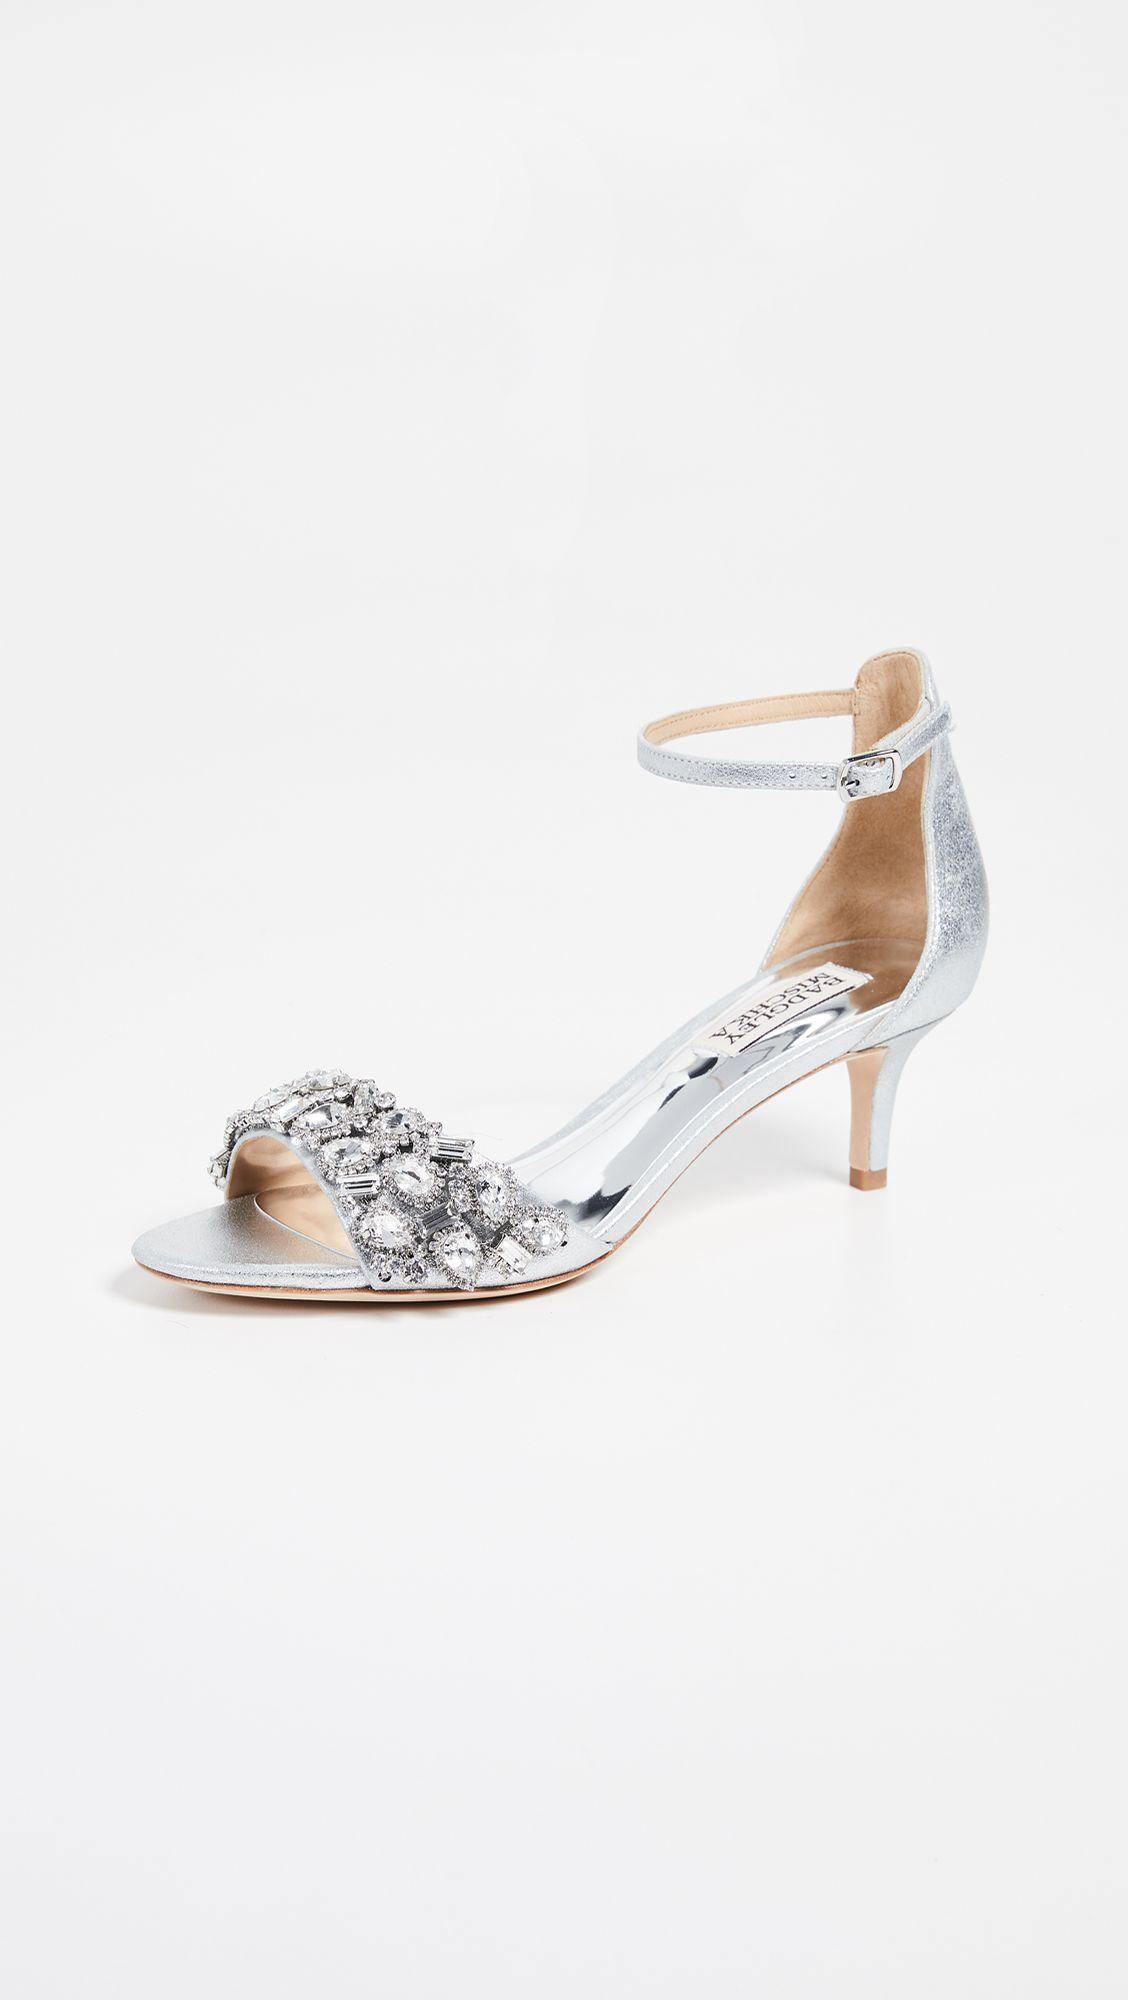 Badgley Mischka Lara Ii Ankle Strap Sandals Ankle Strap Heels Heels Fashion Heels